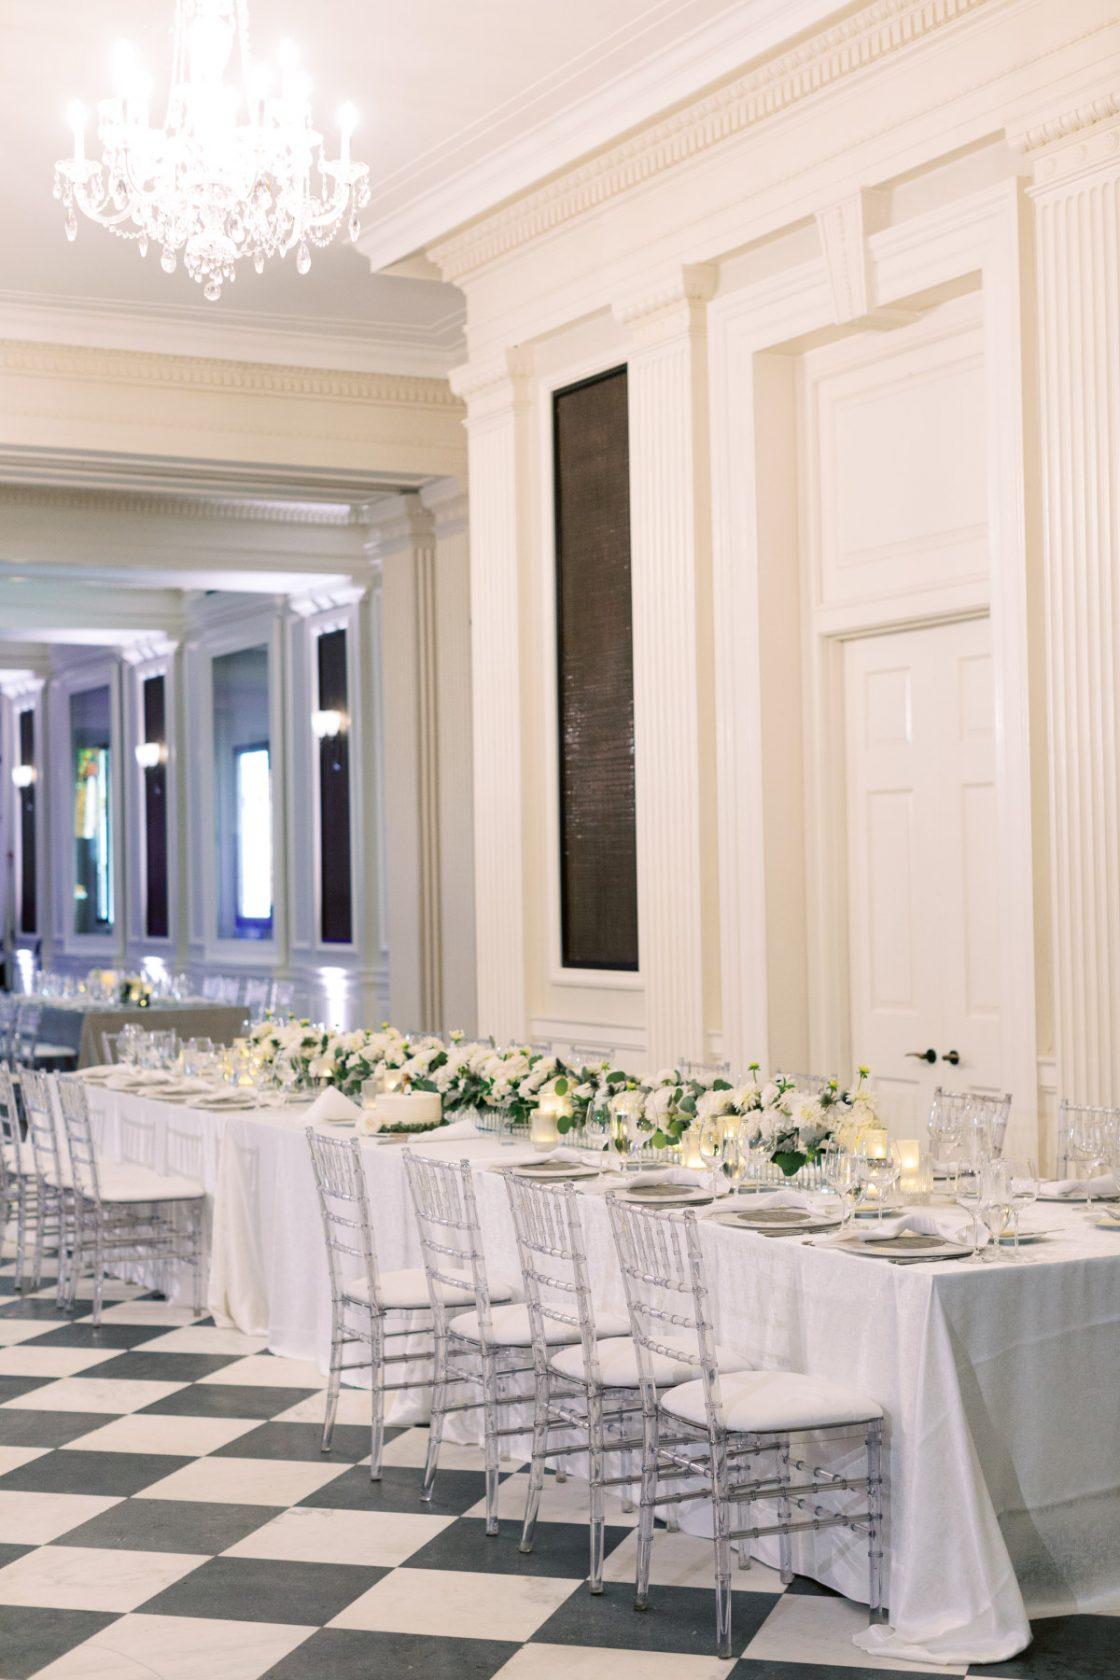 Classic Elegant Black and White Wedding Reception